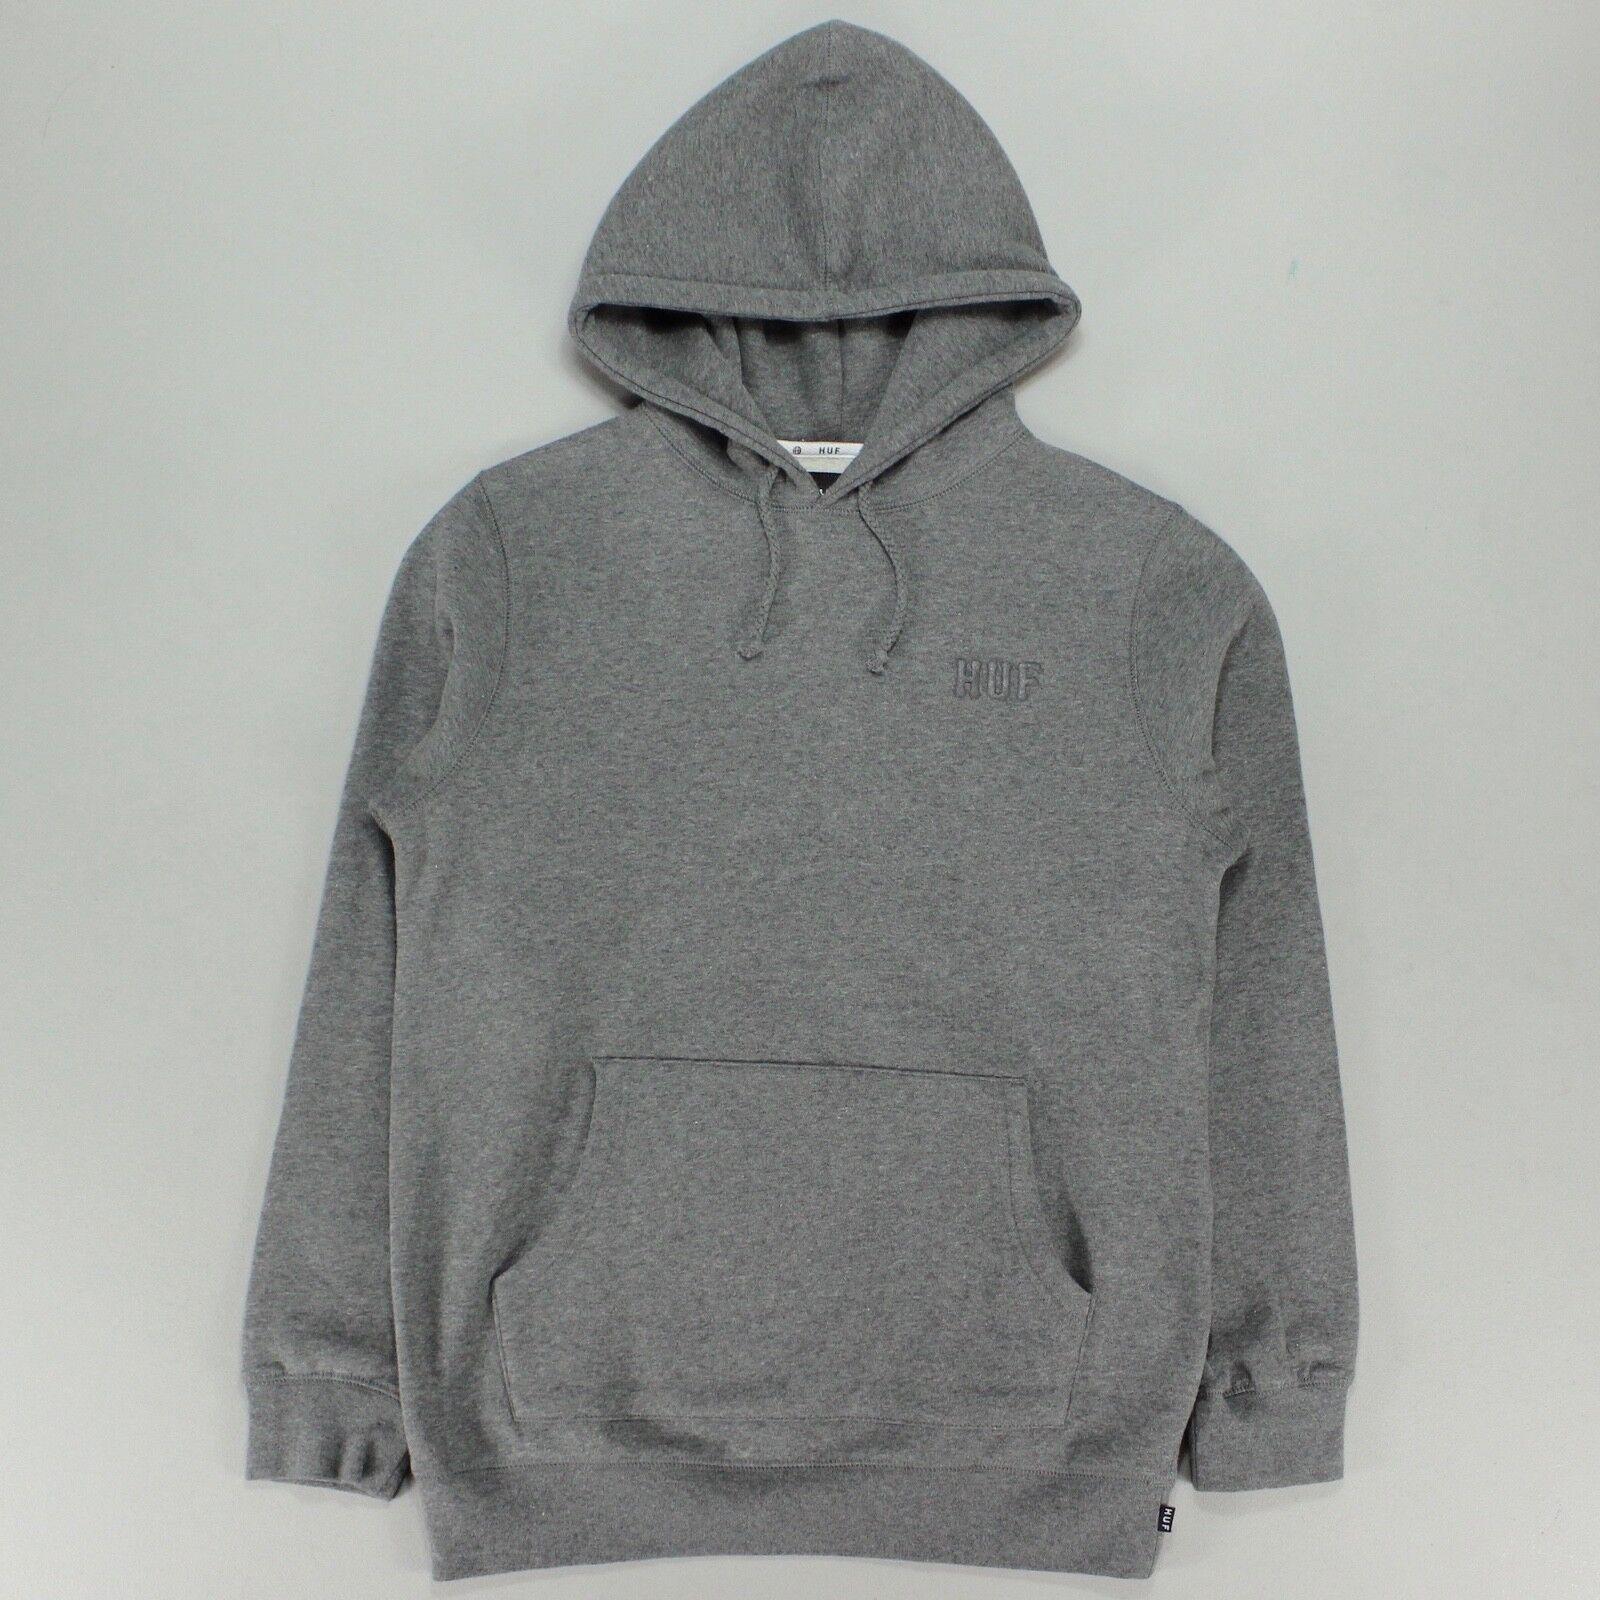 9ae415df8505 Details about HUF Classic H Logo Hoodie Hooded Sweatshirt – Gun Metal  Heather in size S